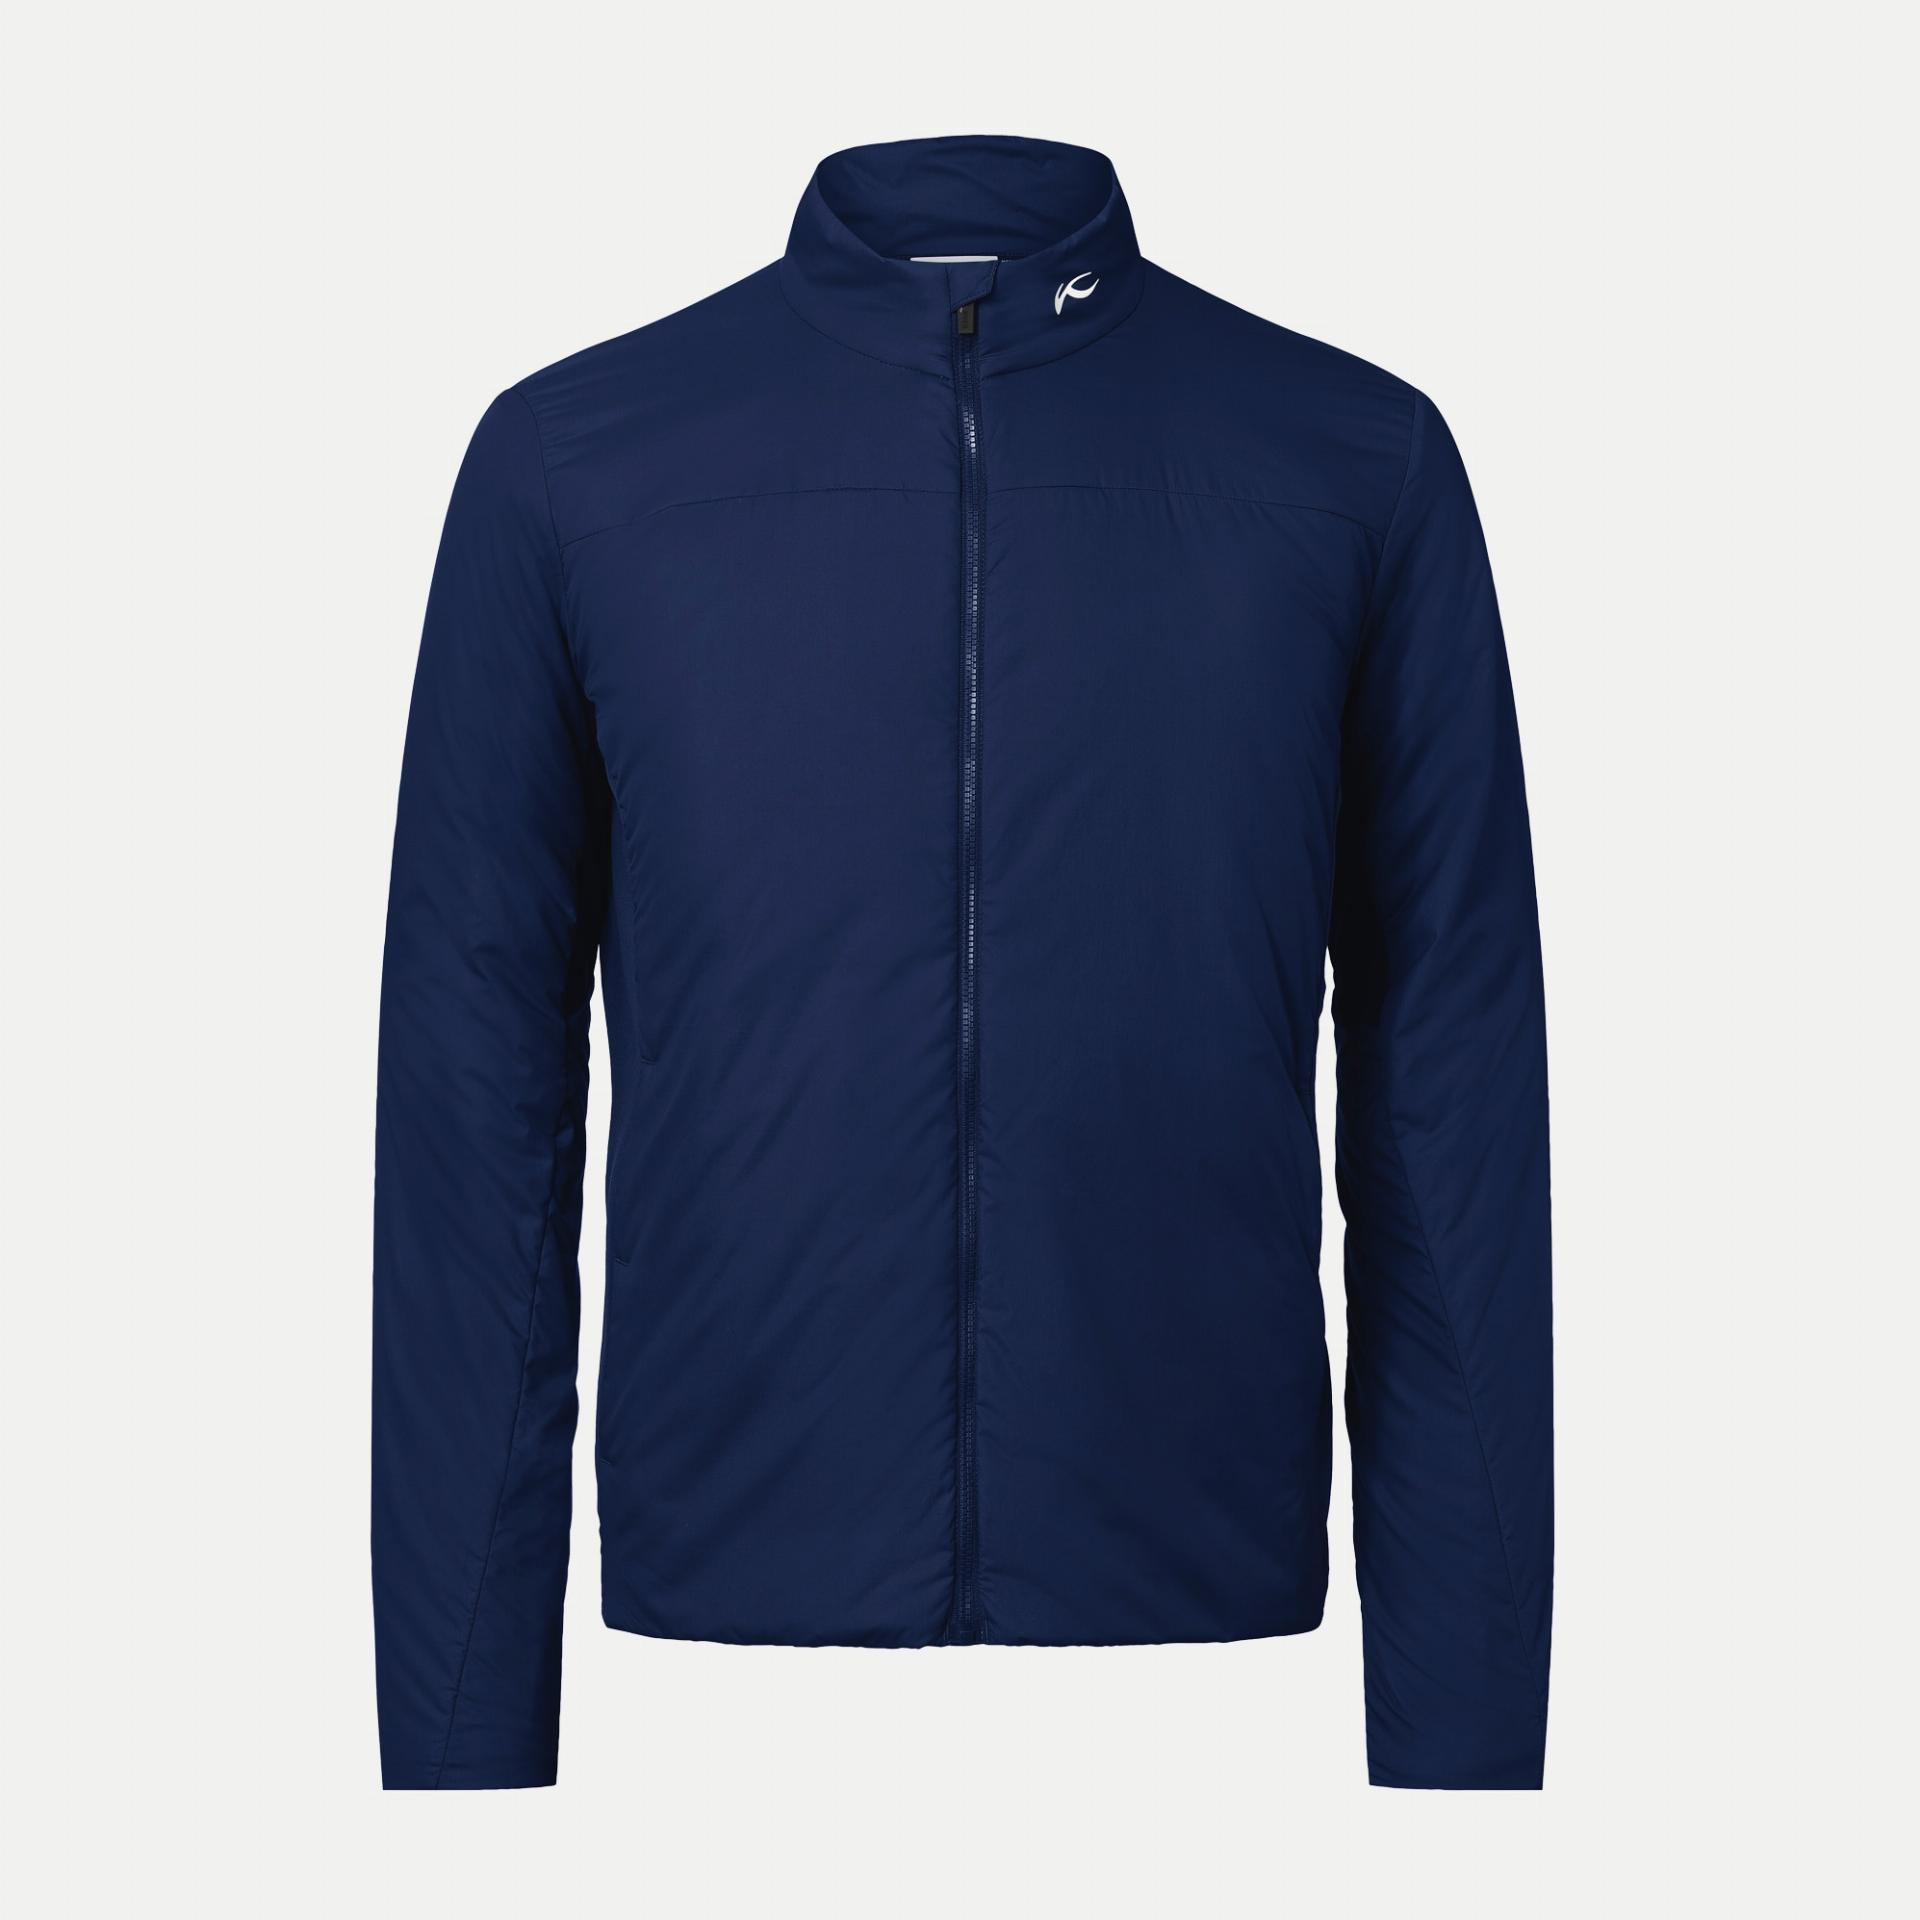 Radiation Jacke, blau